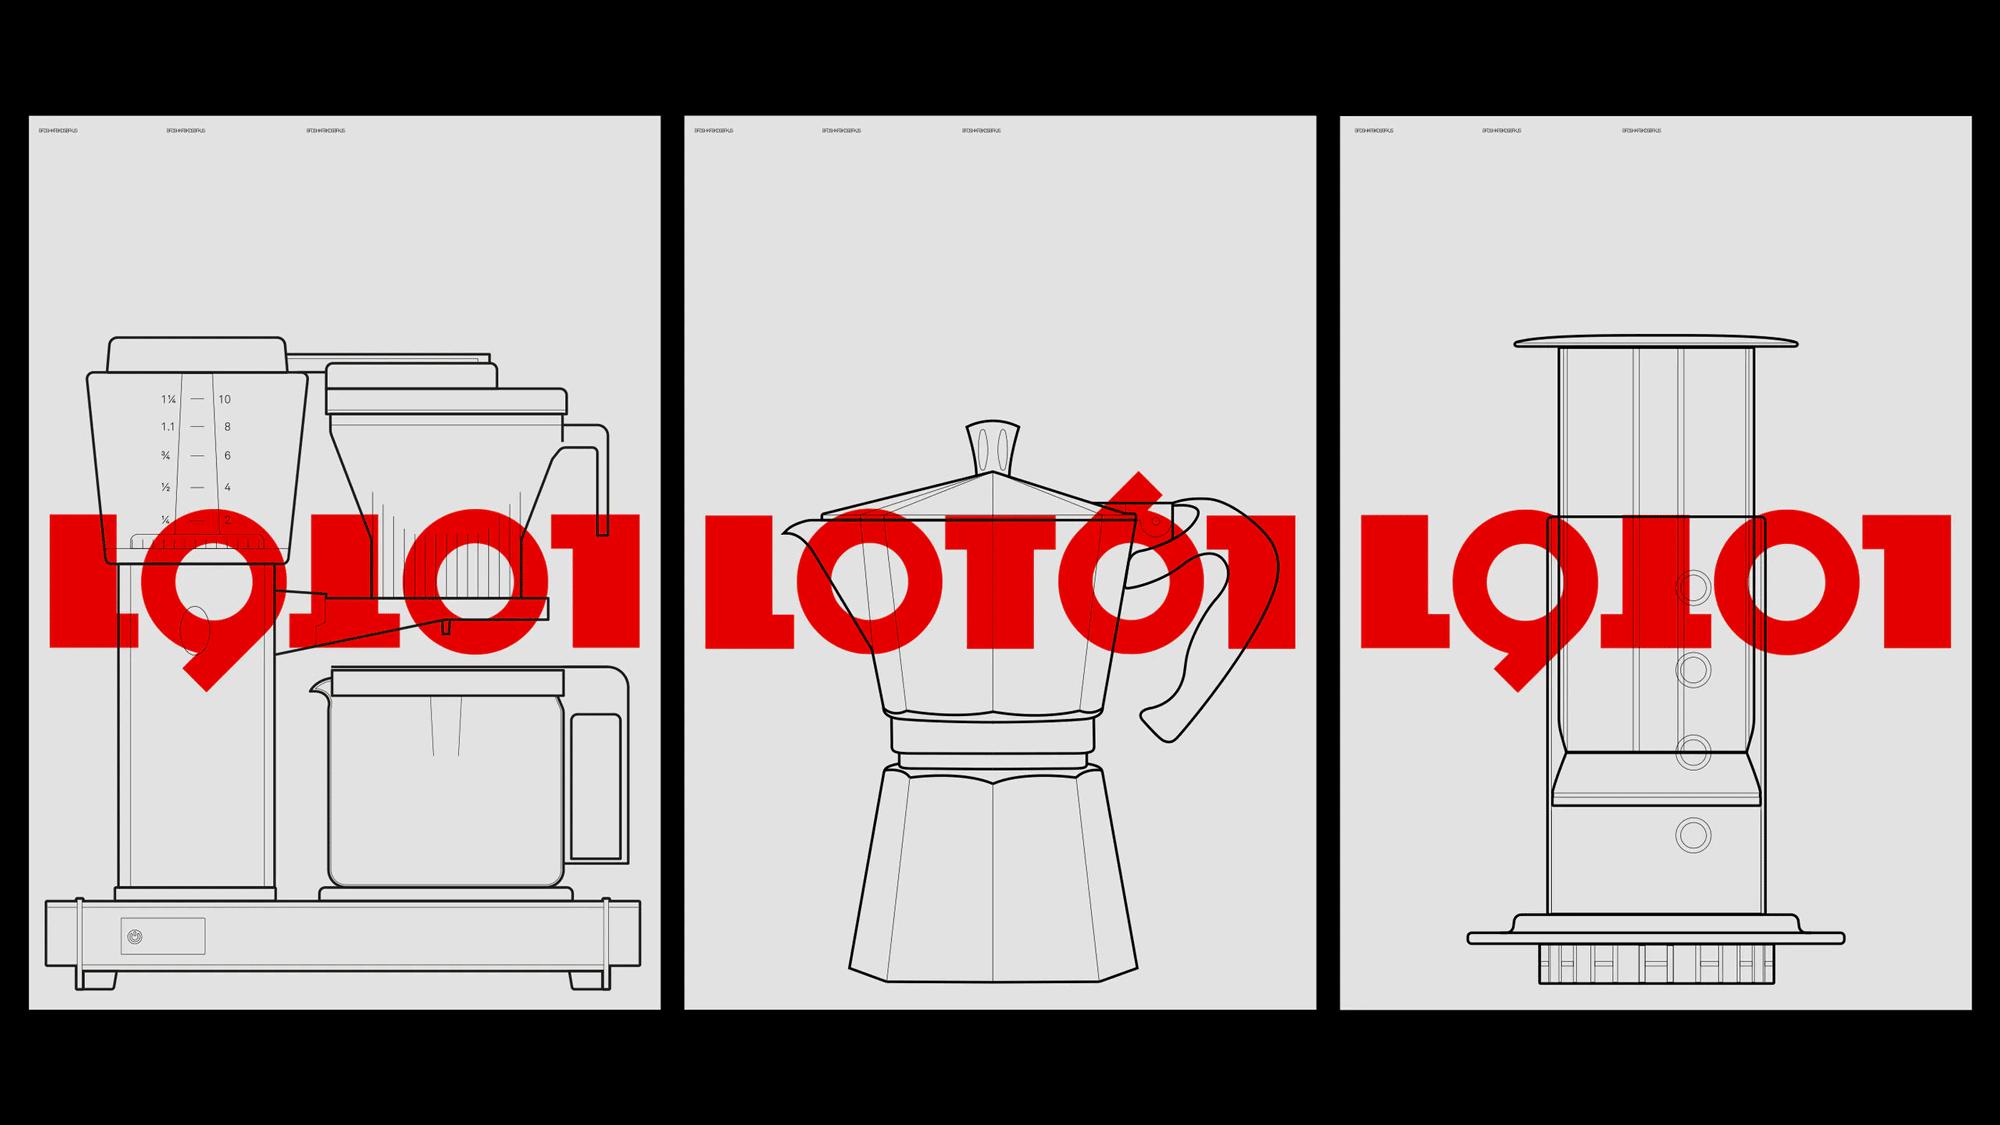 New Logo and Identity for Lot61 by Smörgåsbord